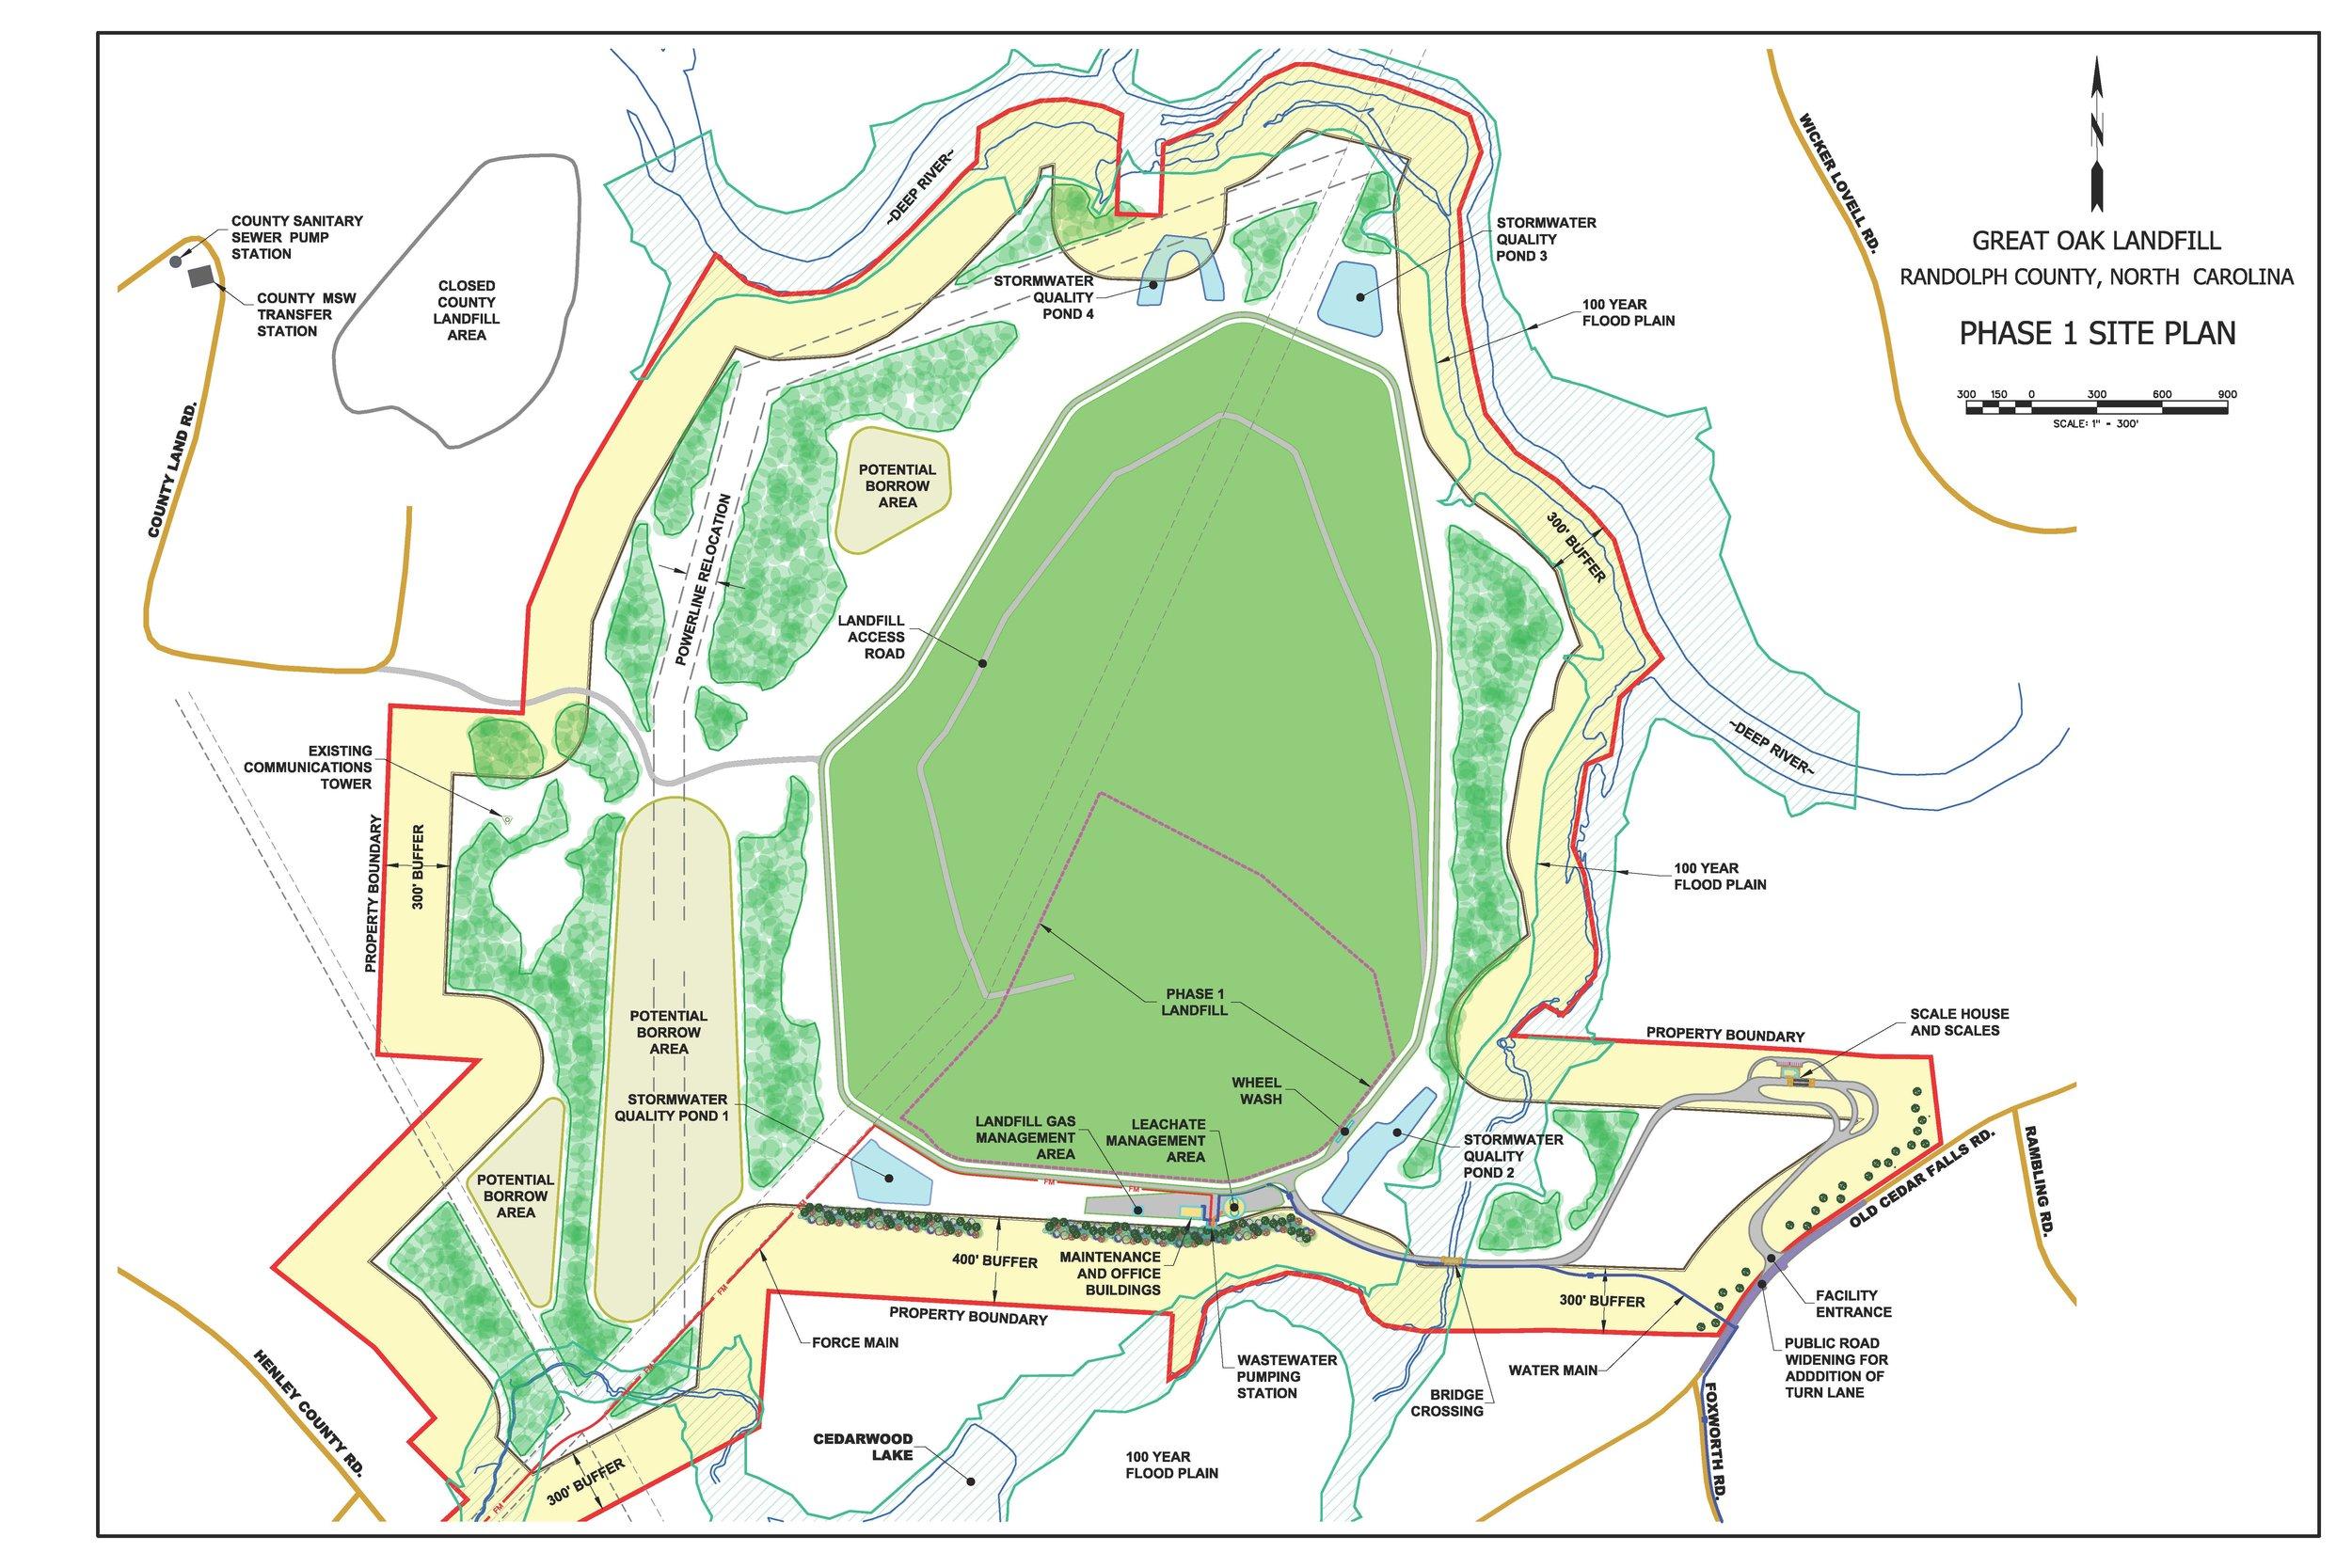 Randolph County's New Landfill Development